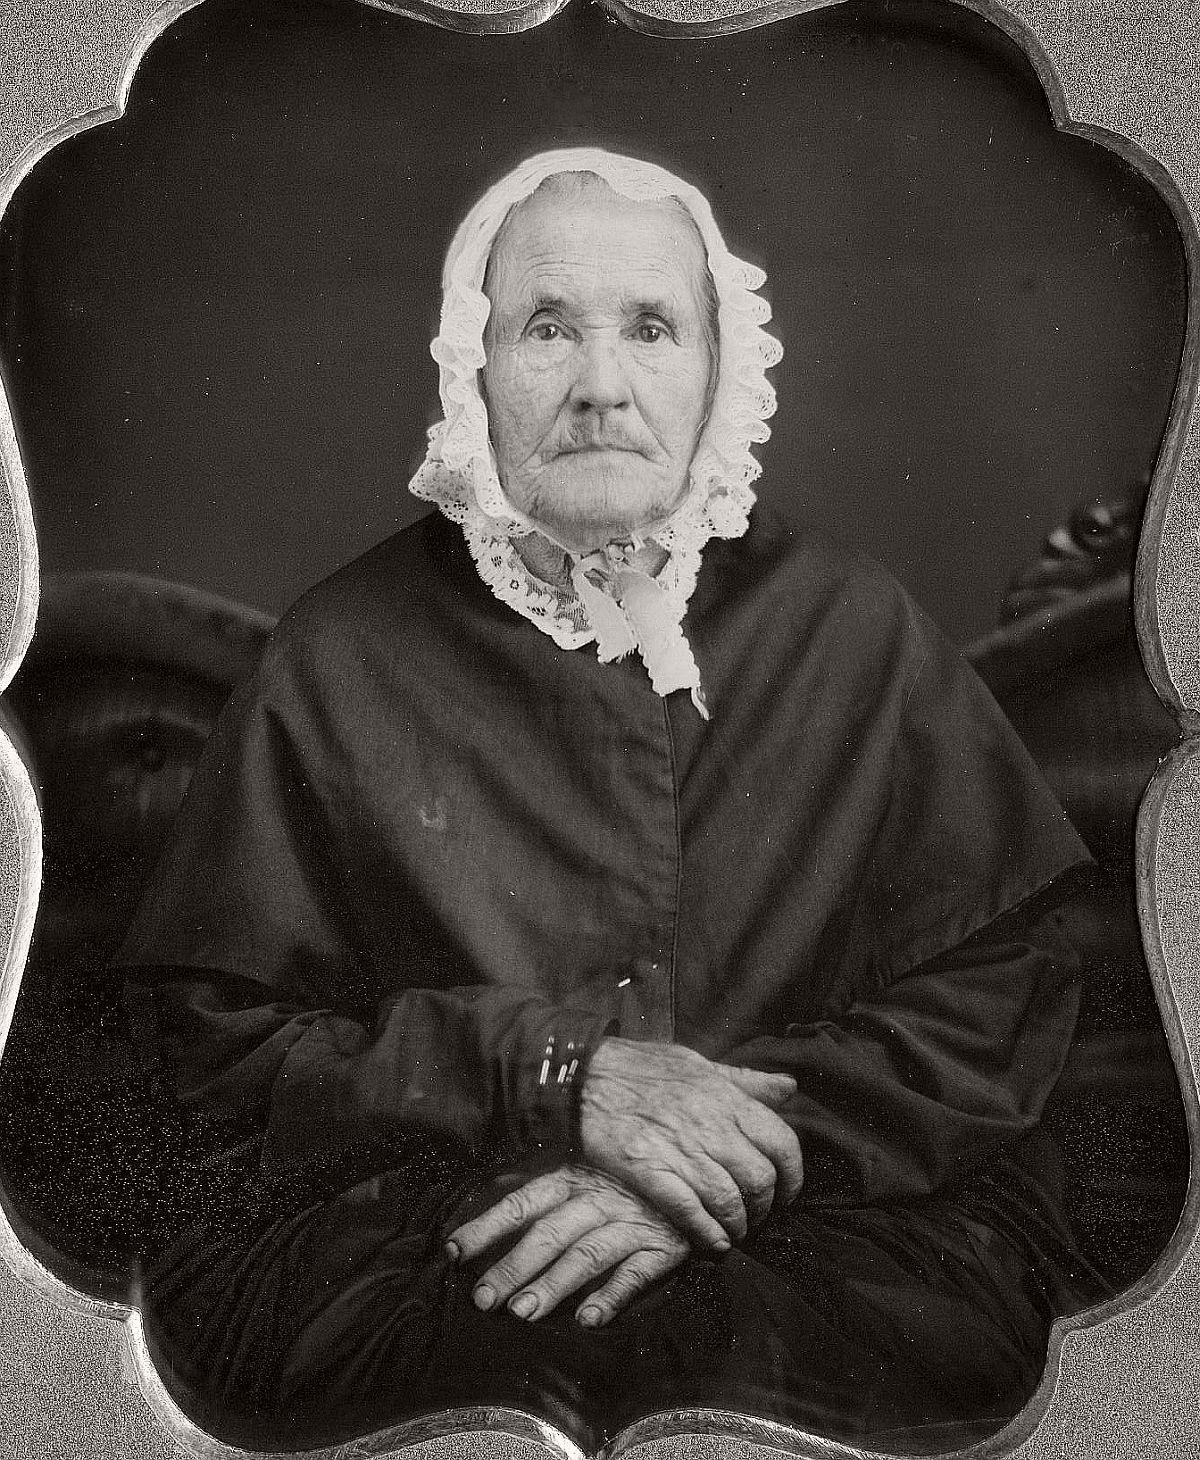 daguerreotype-portrait-ladies-born-in-the-late-18th-century-1700s-vintage-13